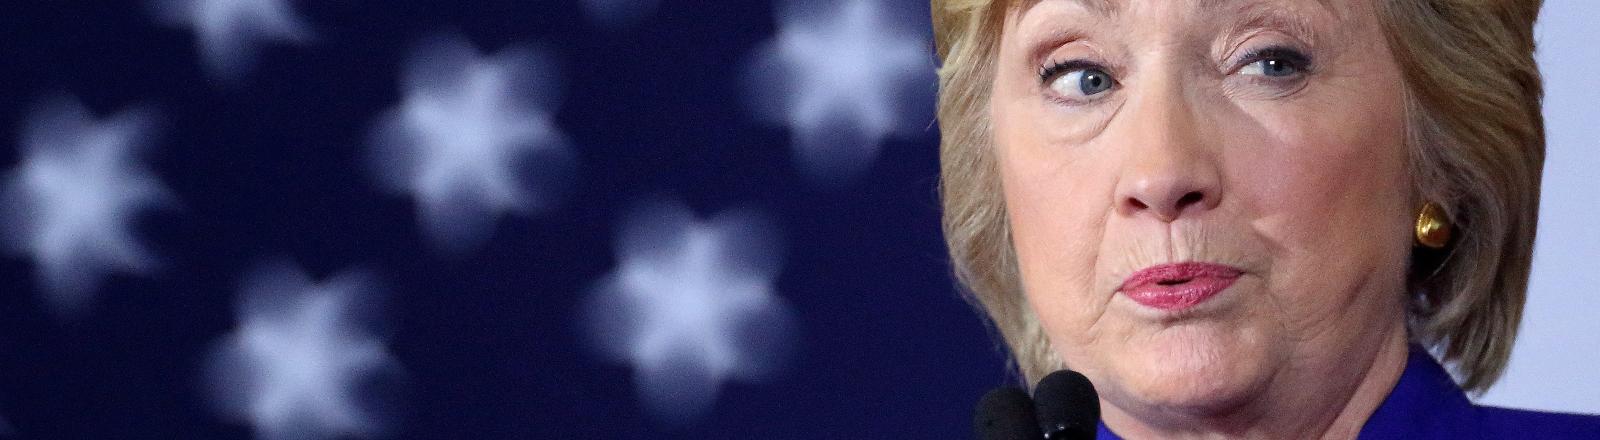 Hillary Clinton vor der US-Flagge.